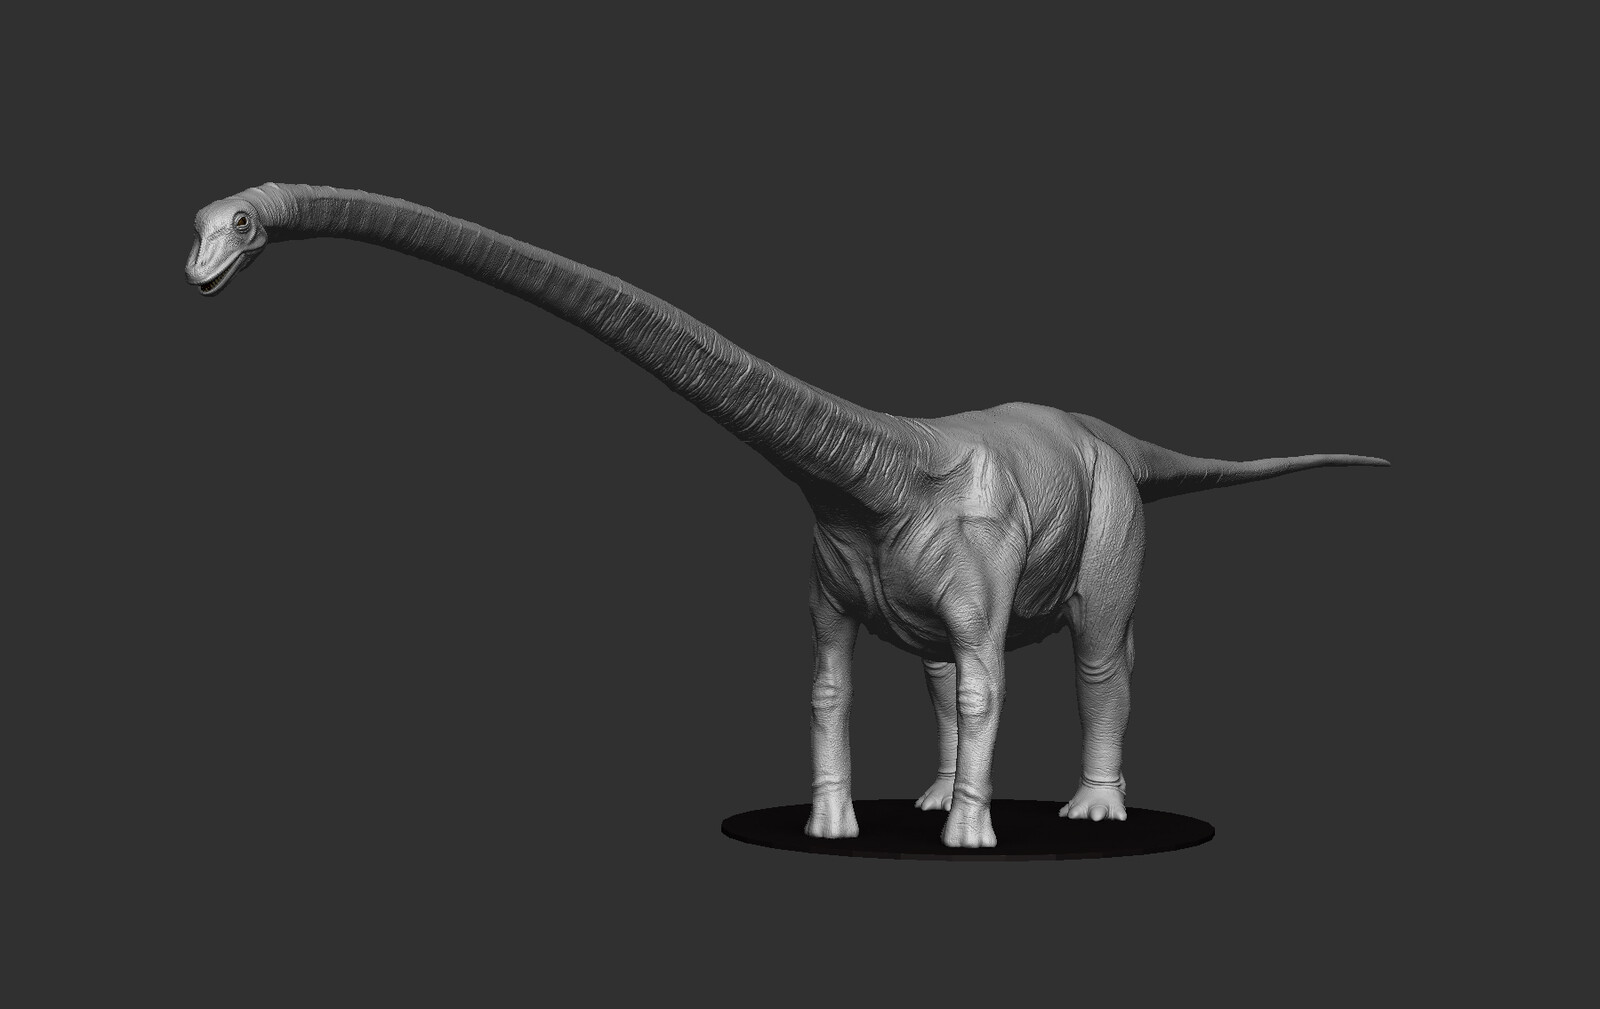 Barosaurous